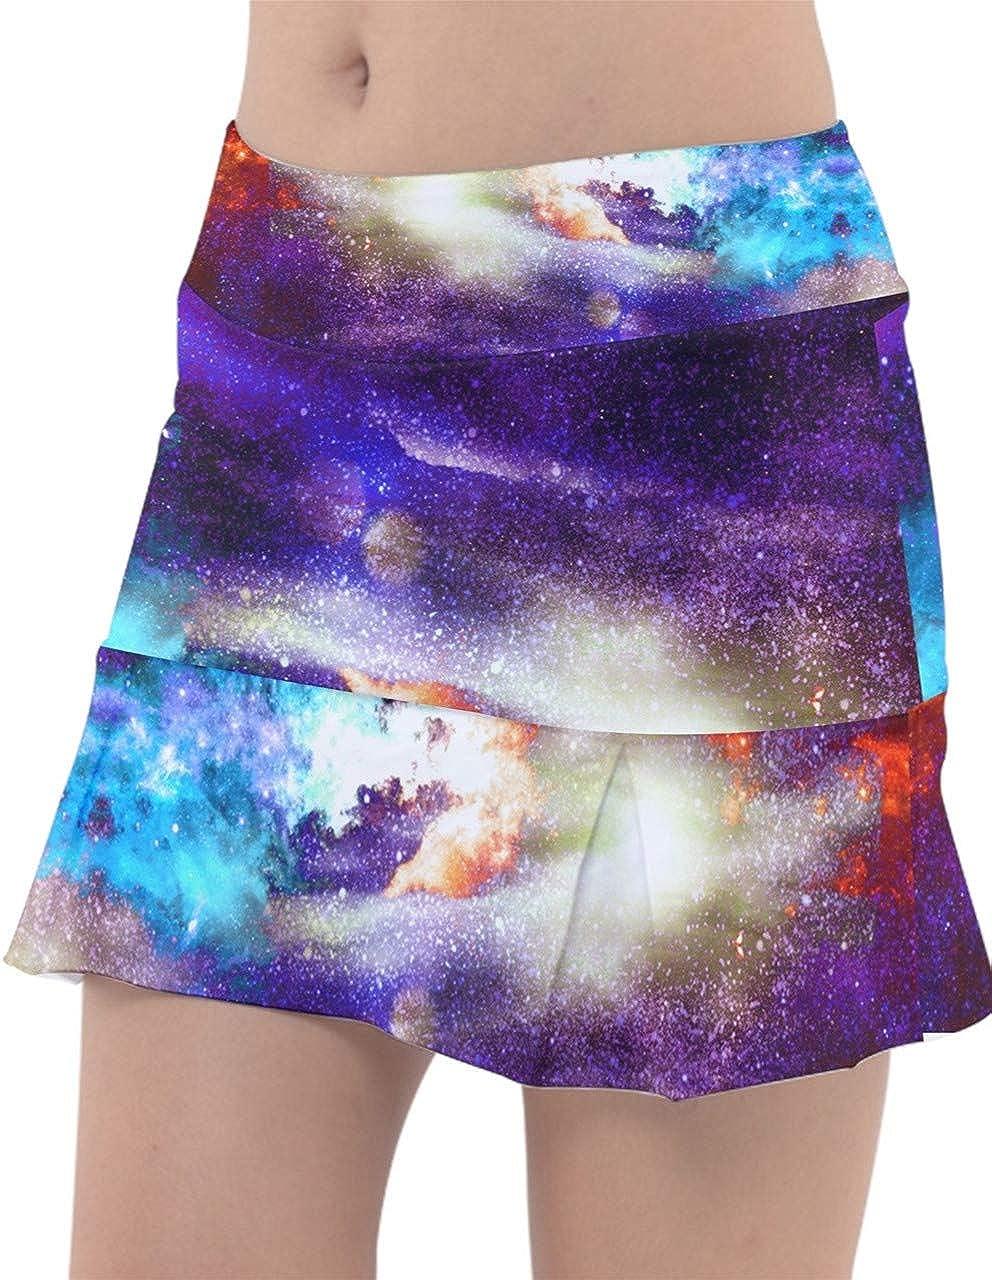 Las Vegas Mall PattyCandy Womens Sports Skort Celestial Galaxy Starry Art famous Sky N